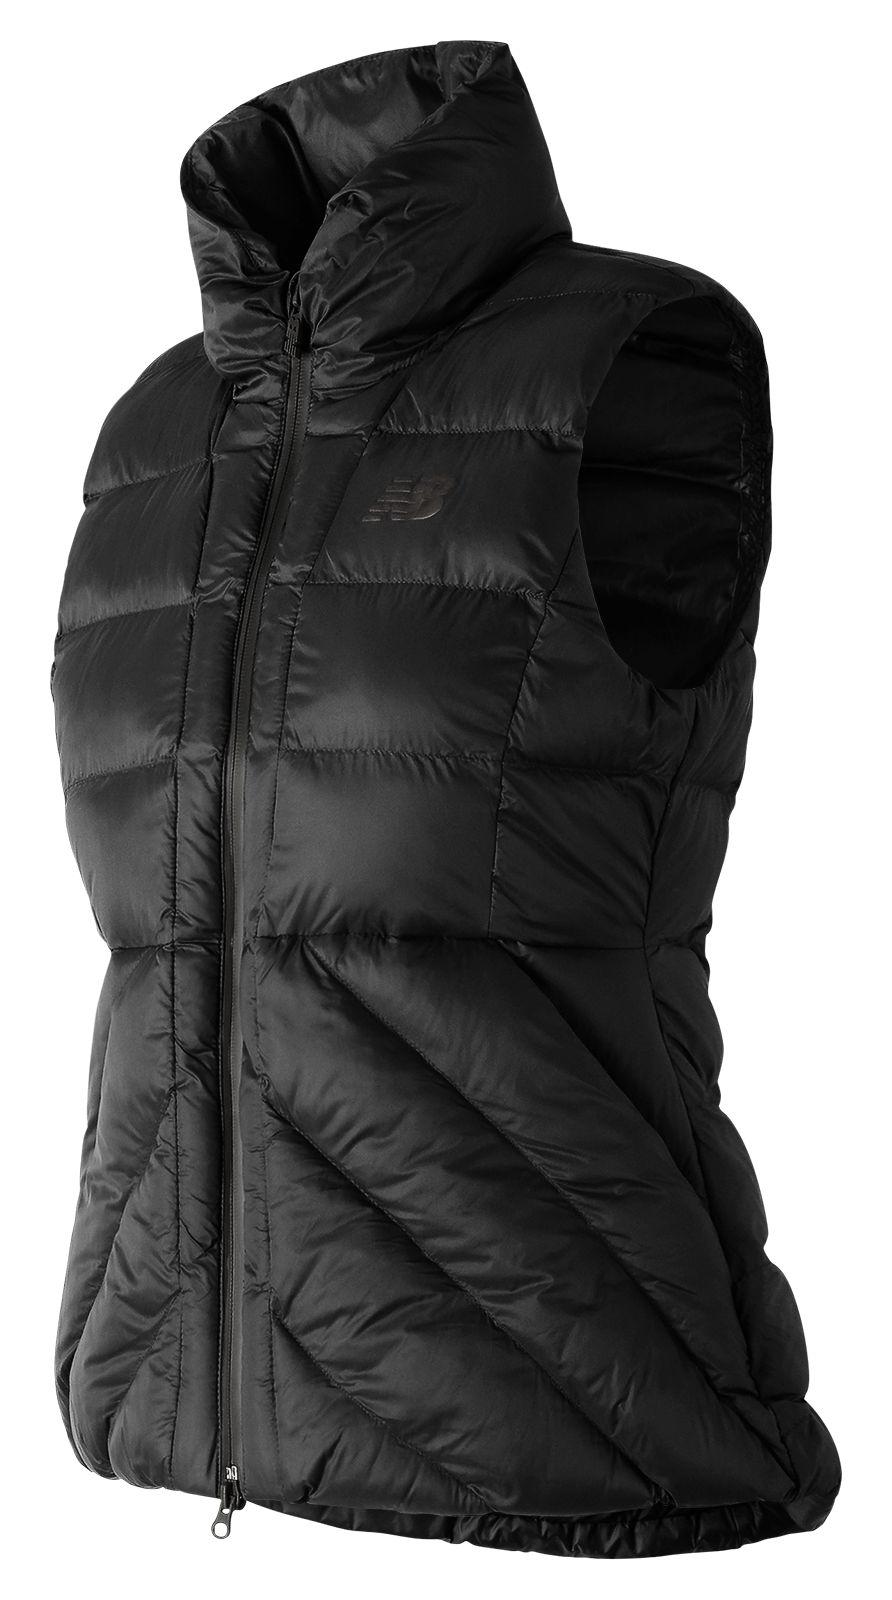 Women's NB Thermal Vest